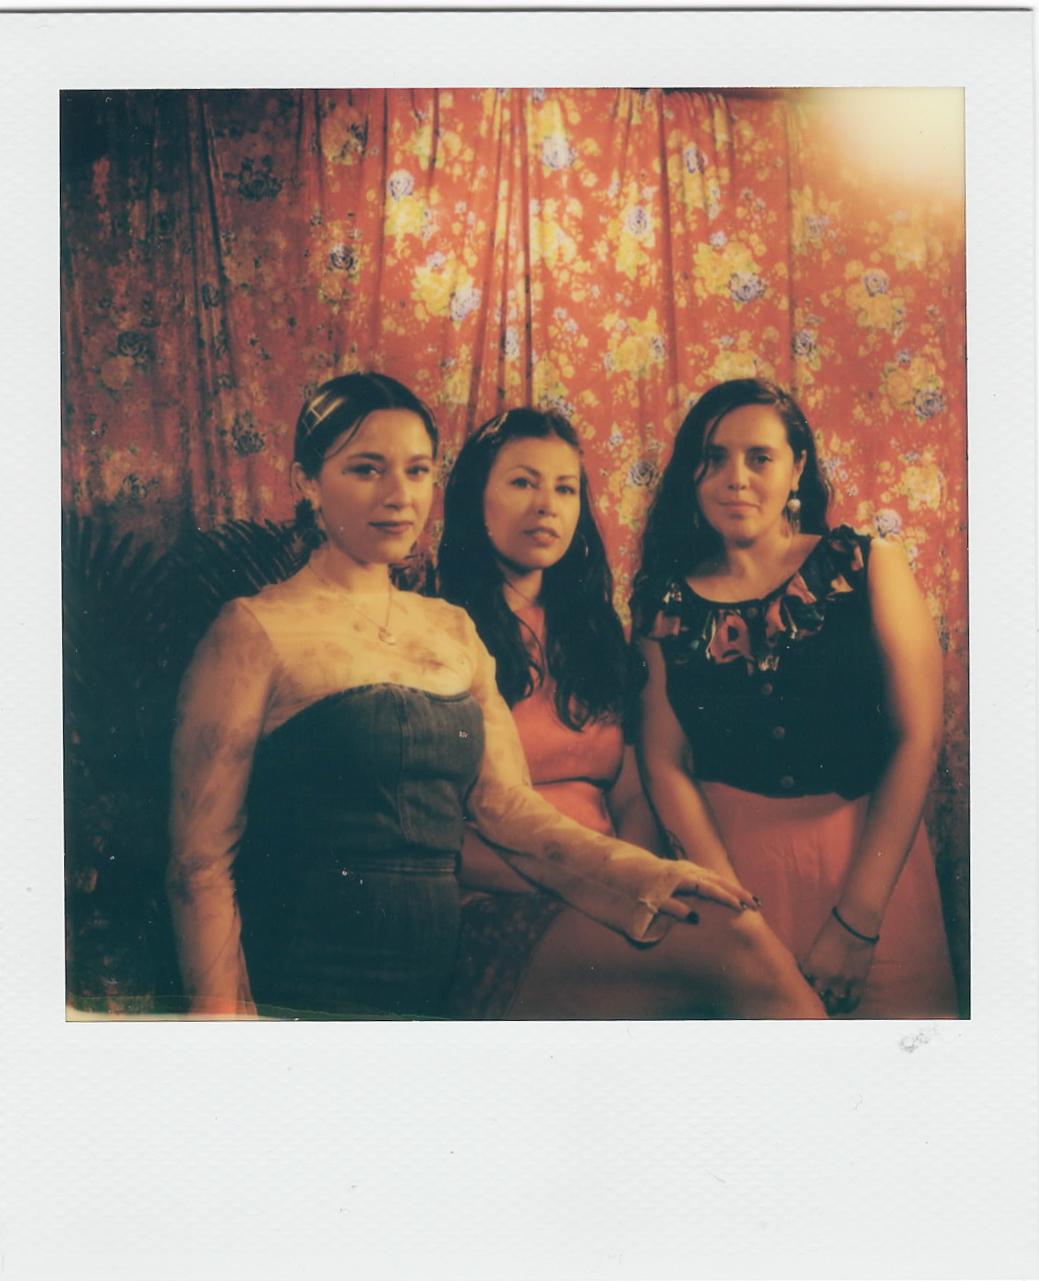 Polaroid by Natalia Mantini